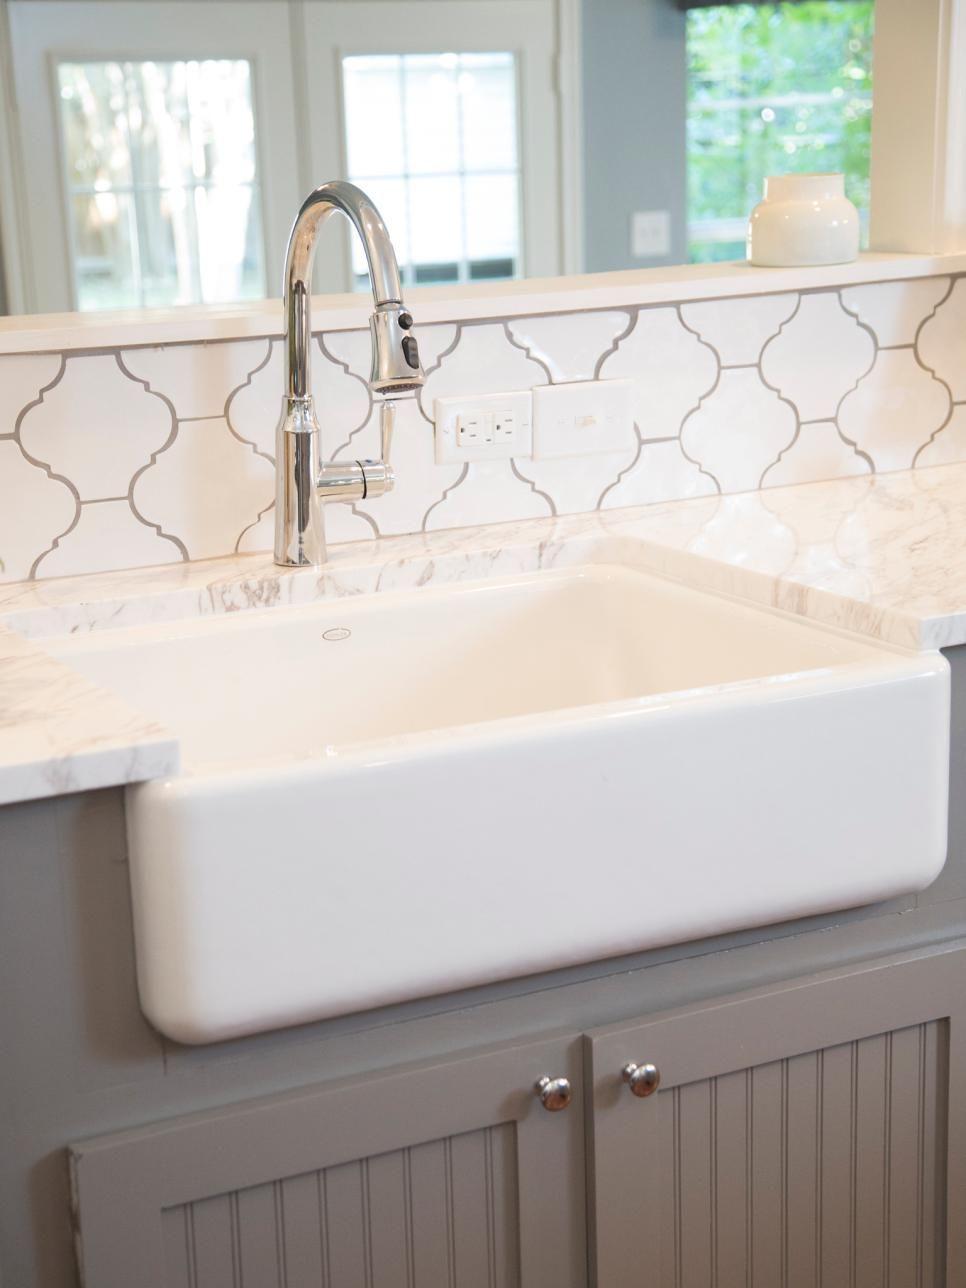 Farmhouse bathroom backsplash ideas - A Moroccan Tile Backsplash Carrara Marble Countertops And A Farmhouse Sink Add Charming Character To